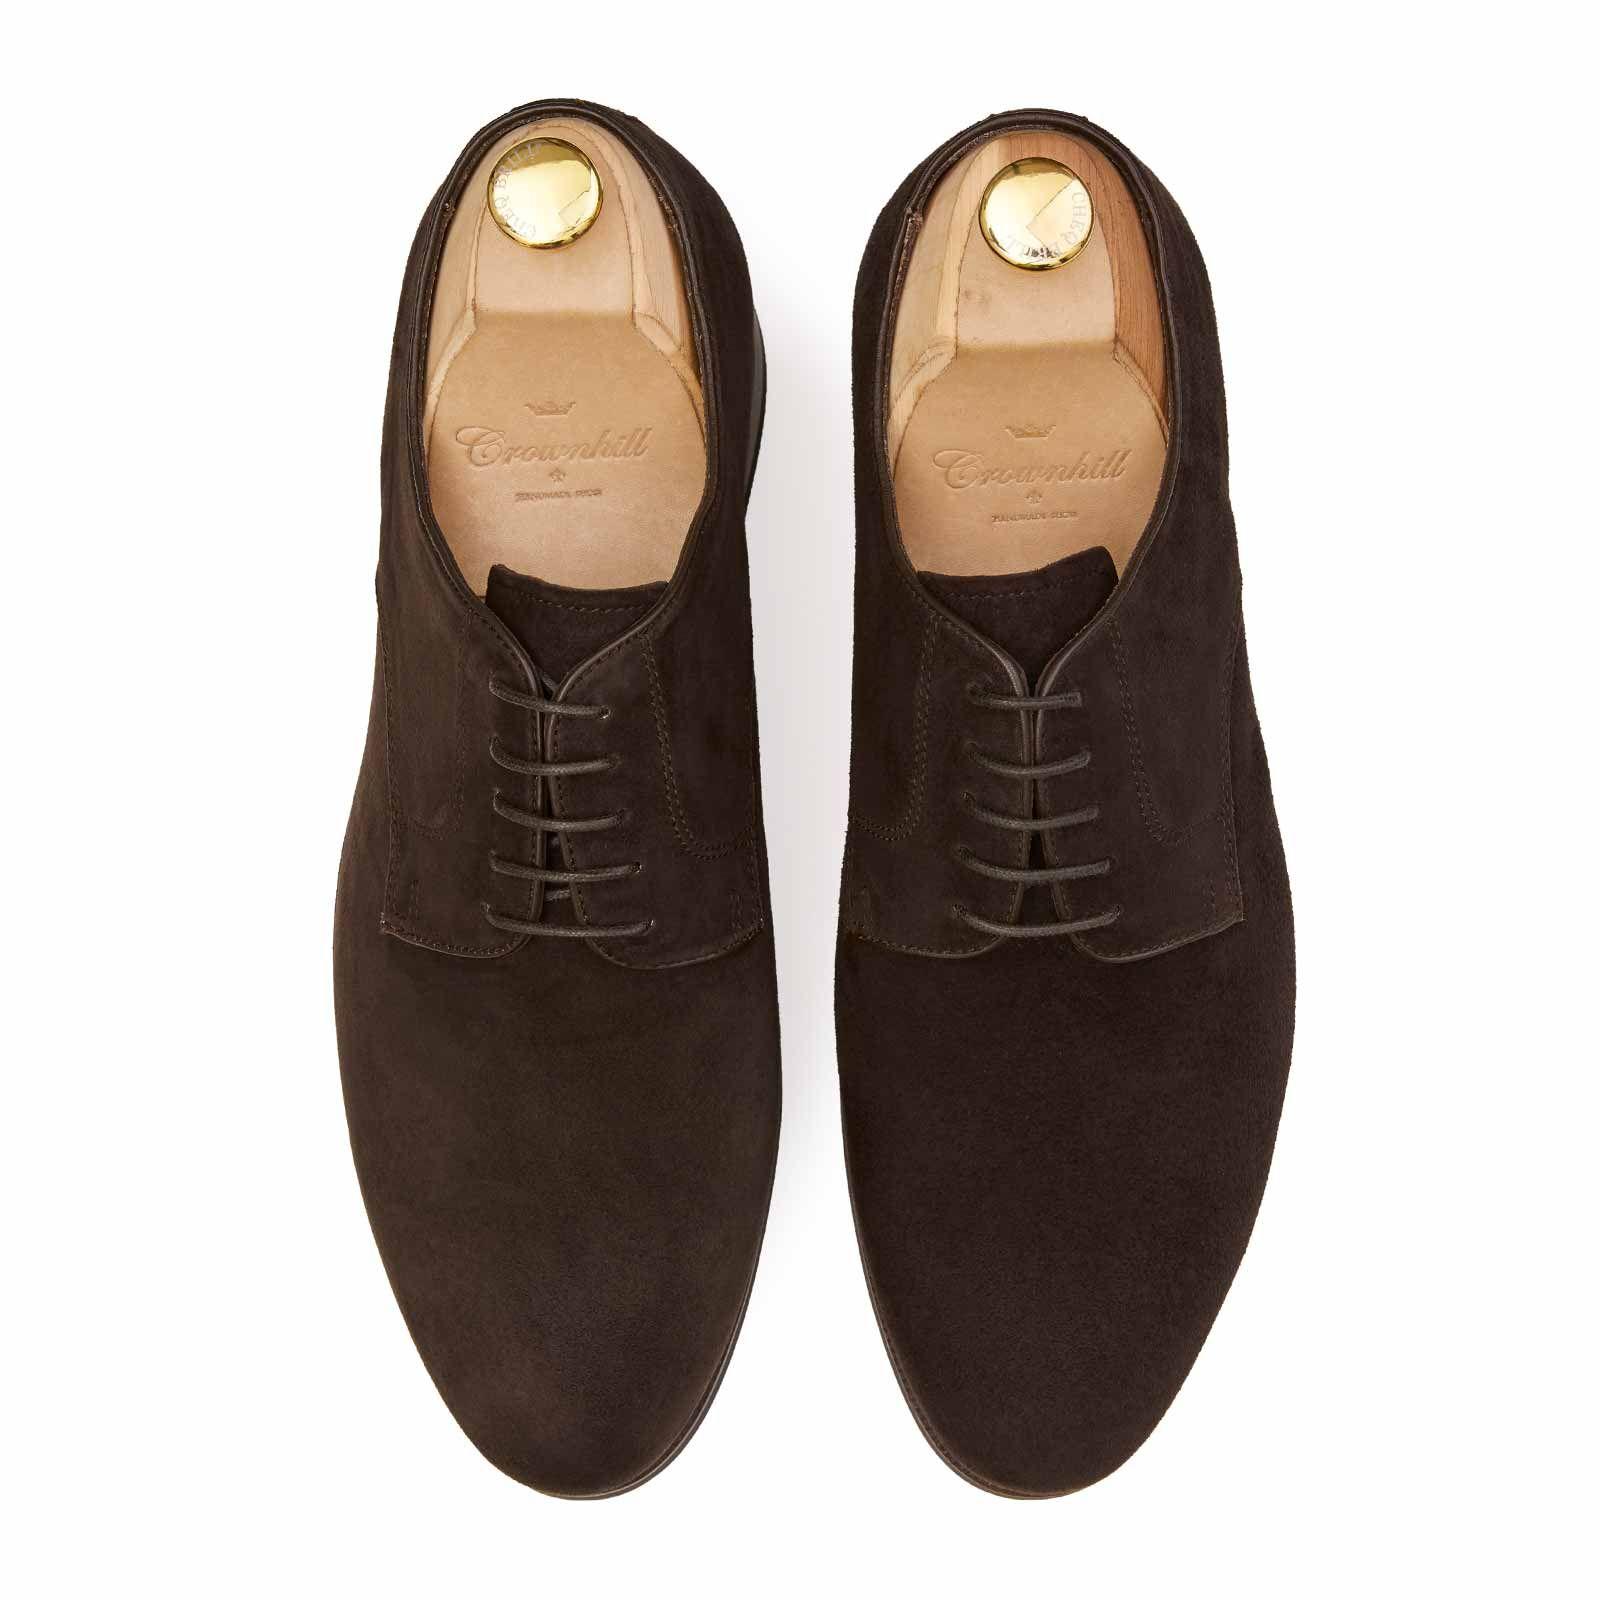 Brown Suede Derby shoe rubber Sole